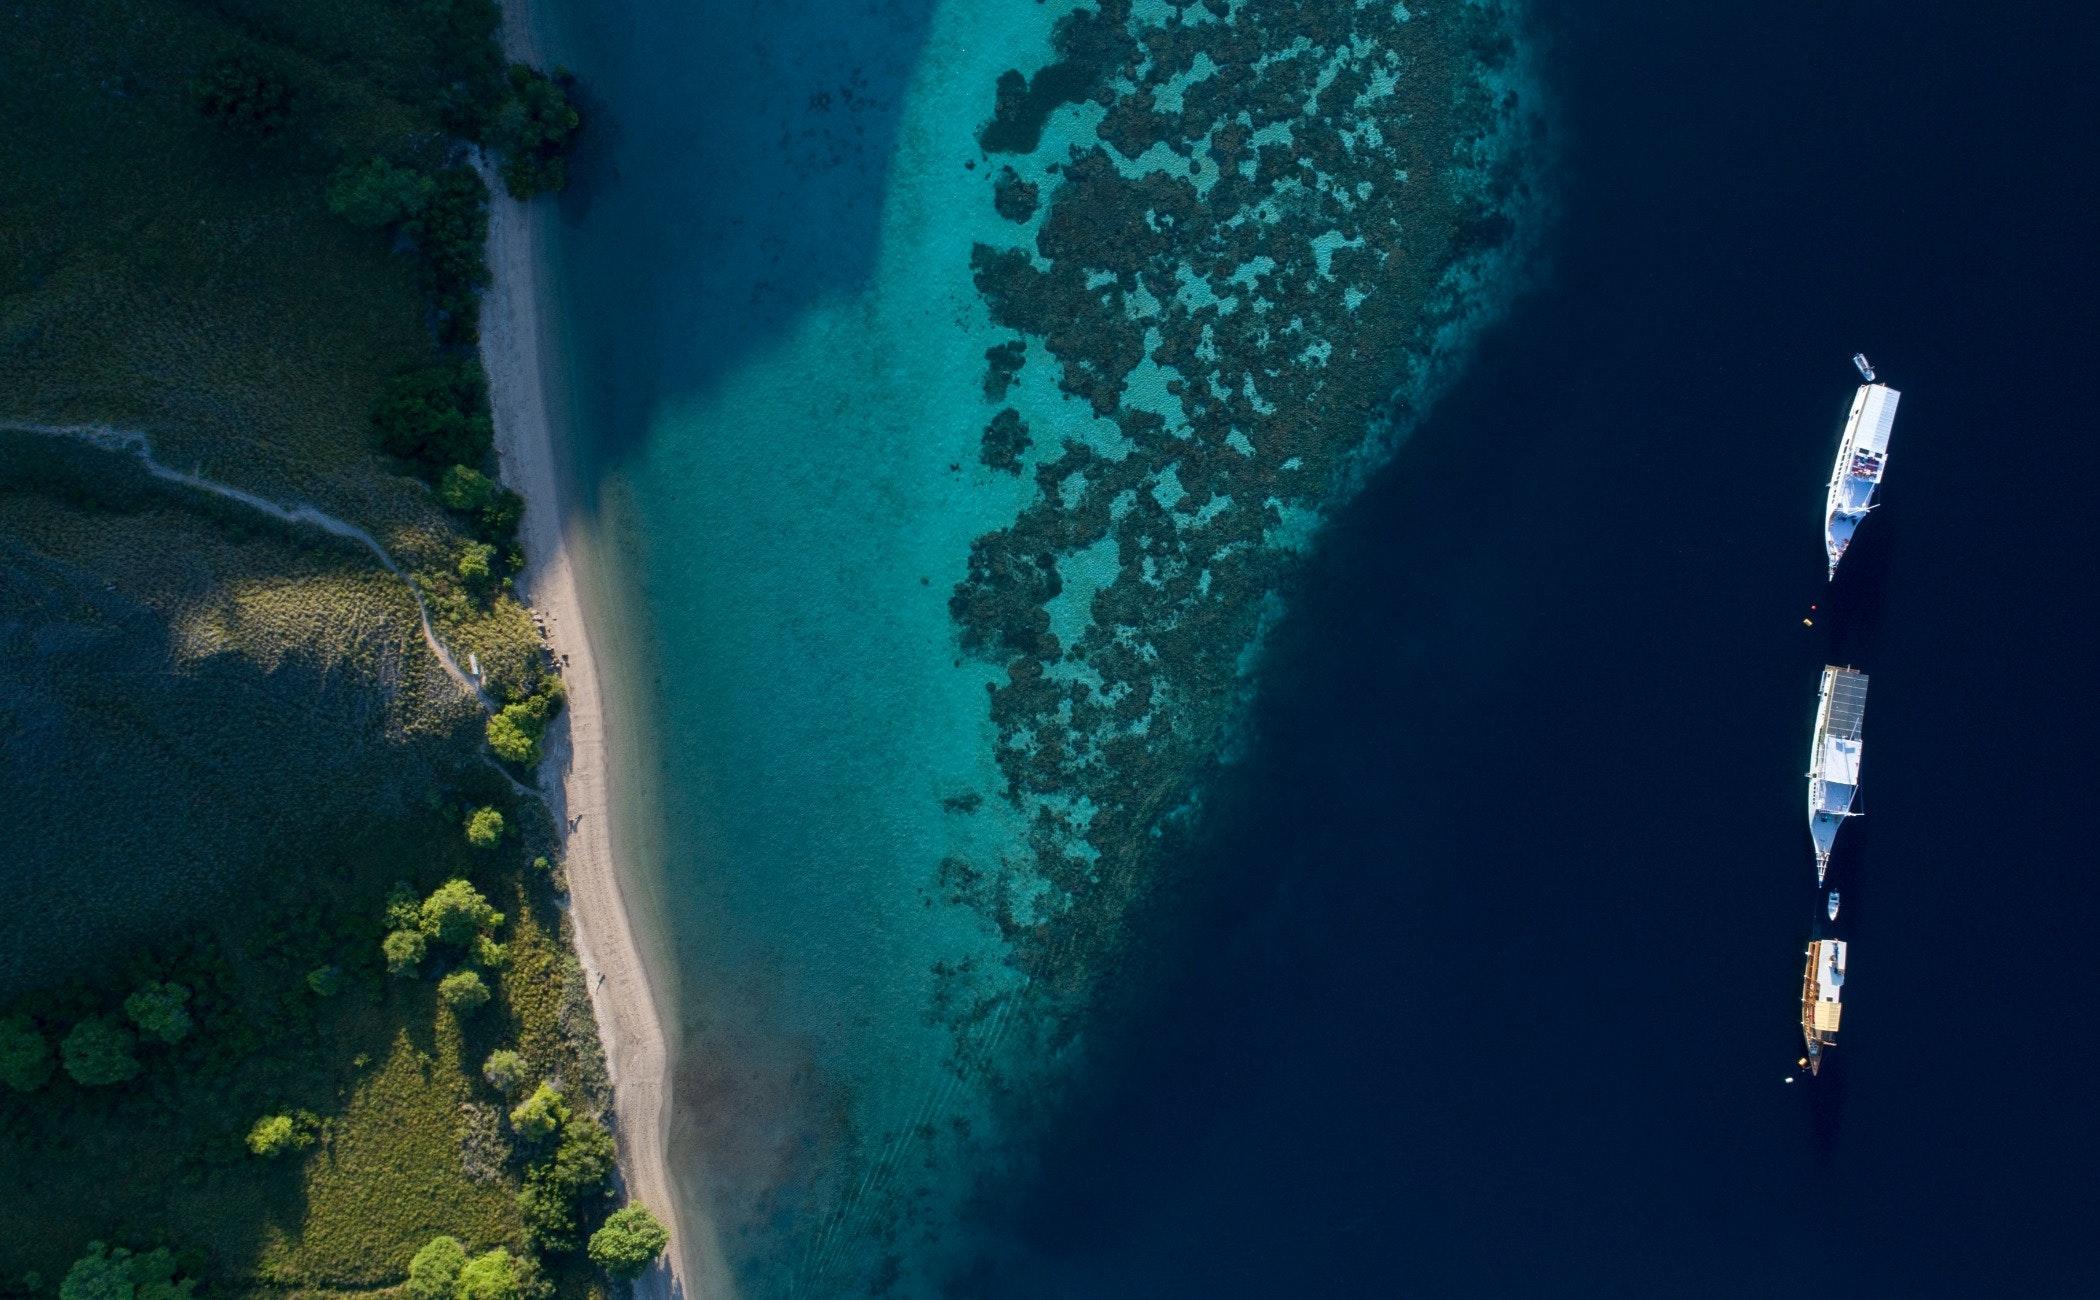 land,nature,outdoors,sea,water,shoreline,landscape,scenery,coast,beach